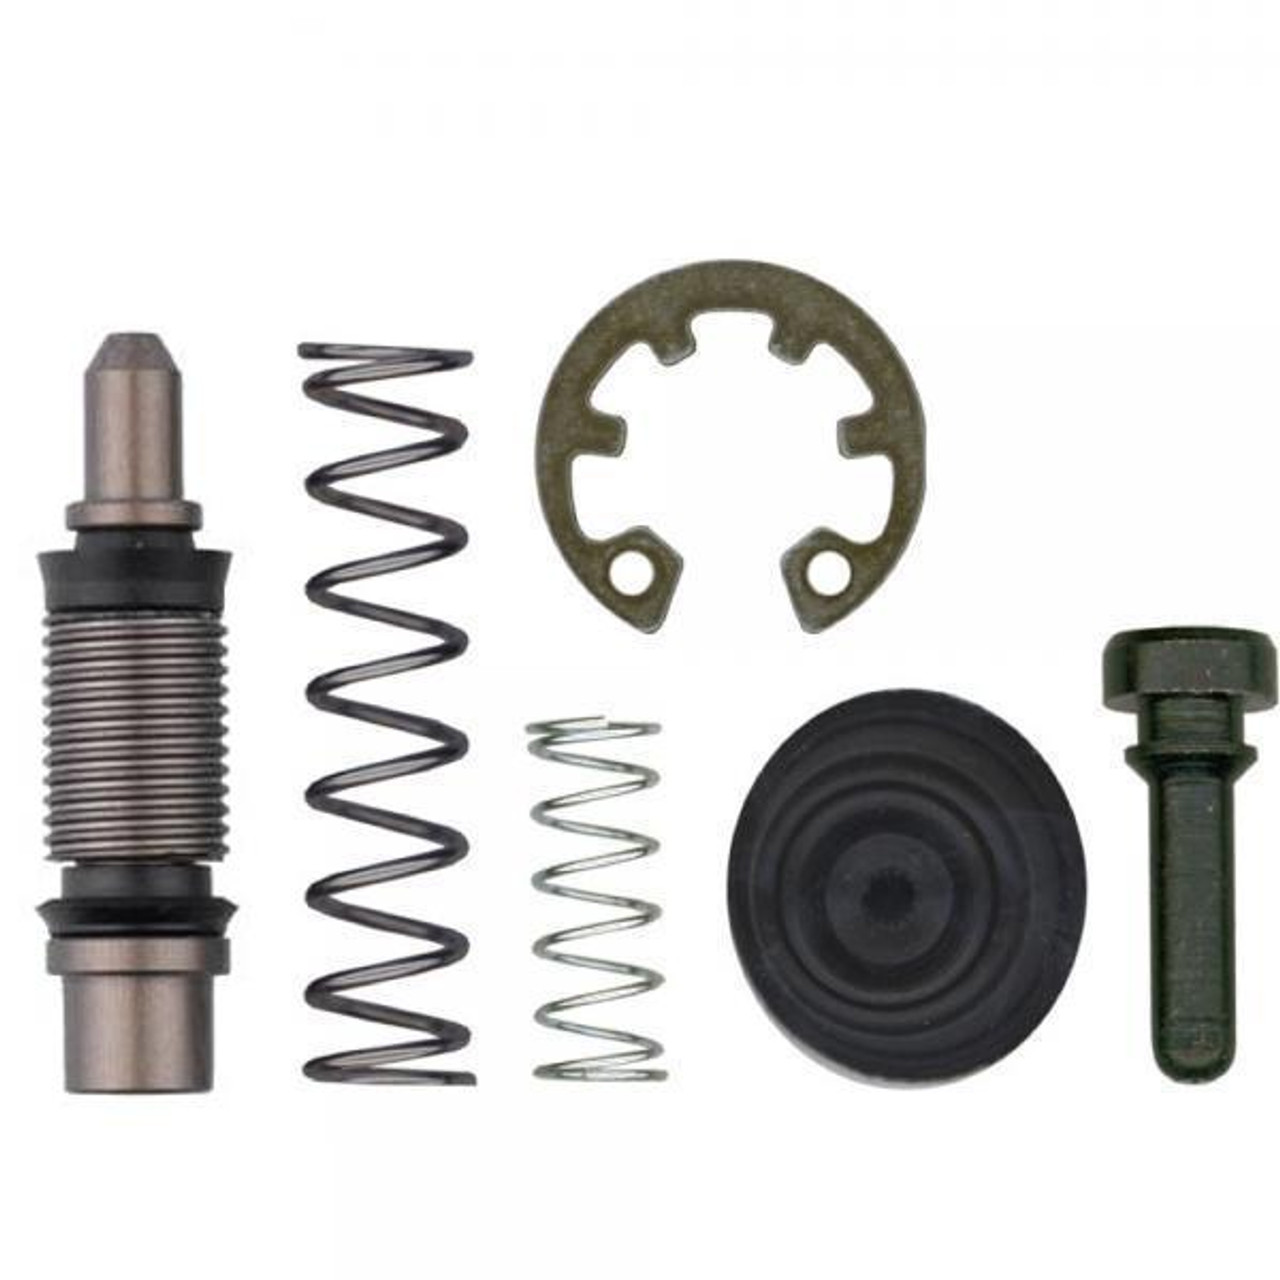 Braktec repair kit clutch master cylinder mineral oil 15000605C